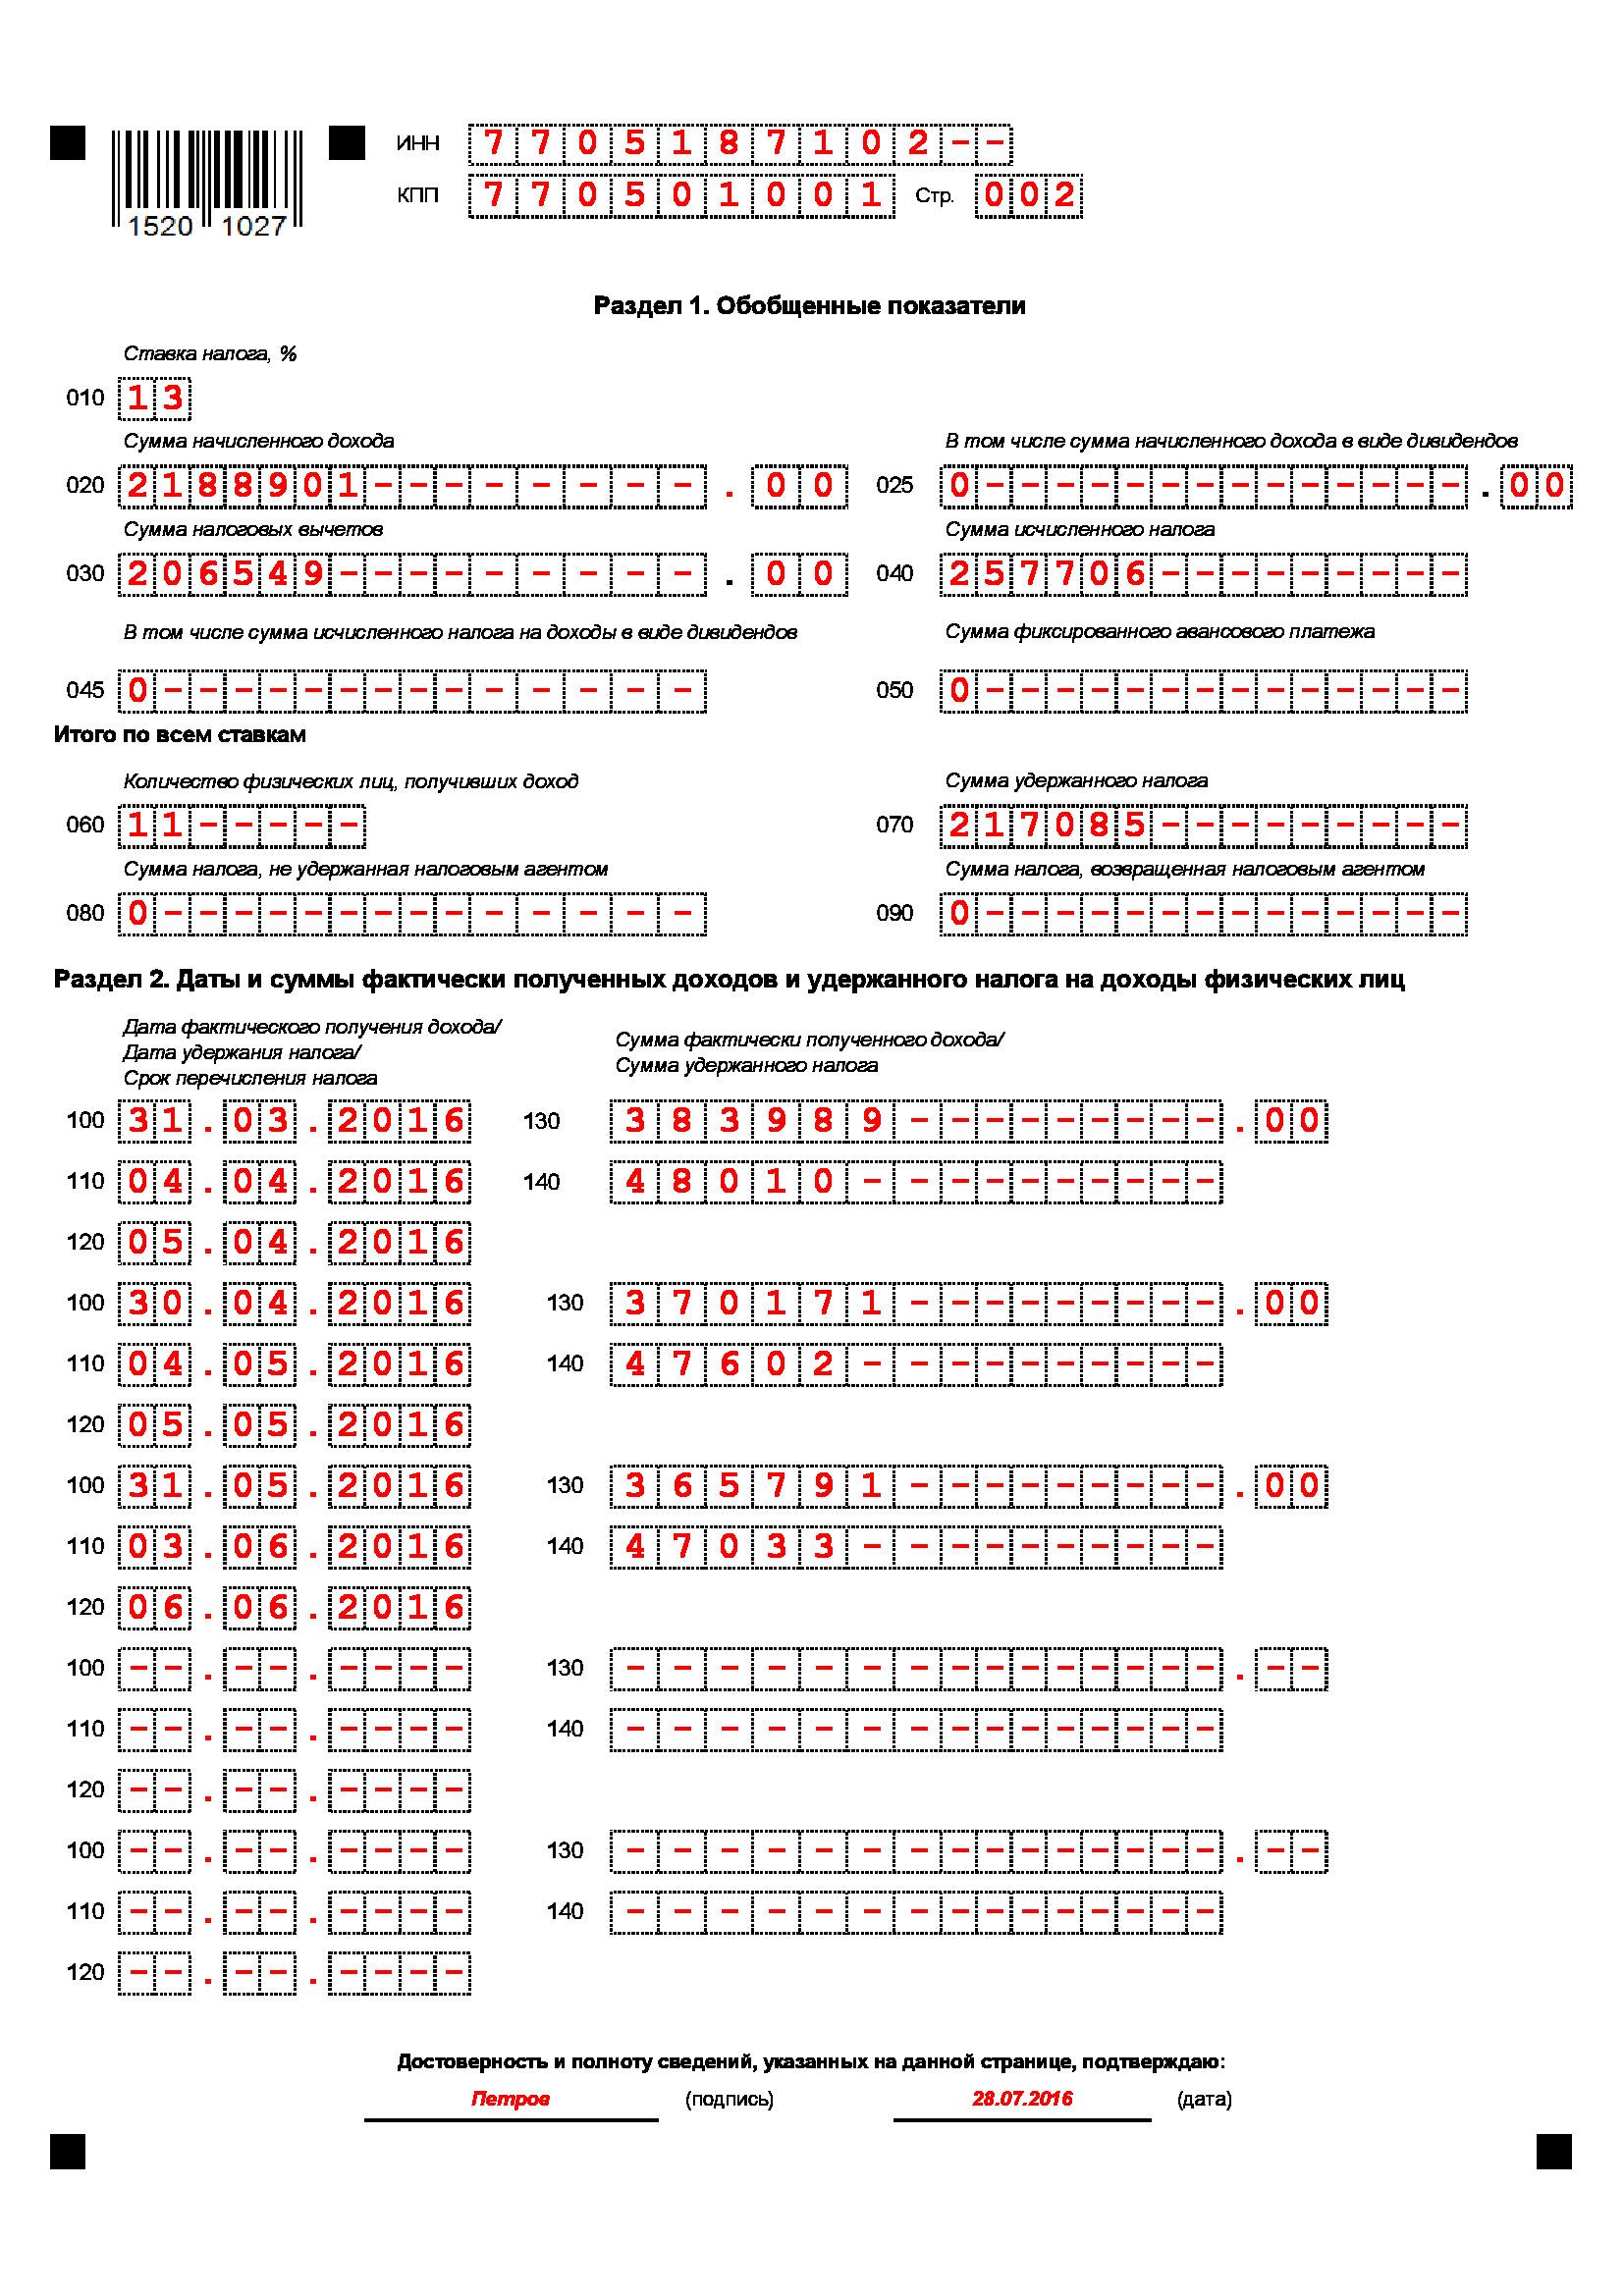 Primer-zapolneniay-6-ndfl-za-2-kvartal-2016-goda---2